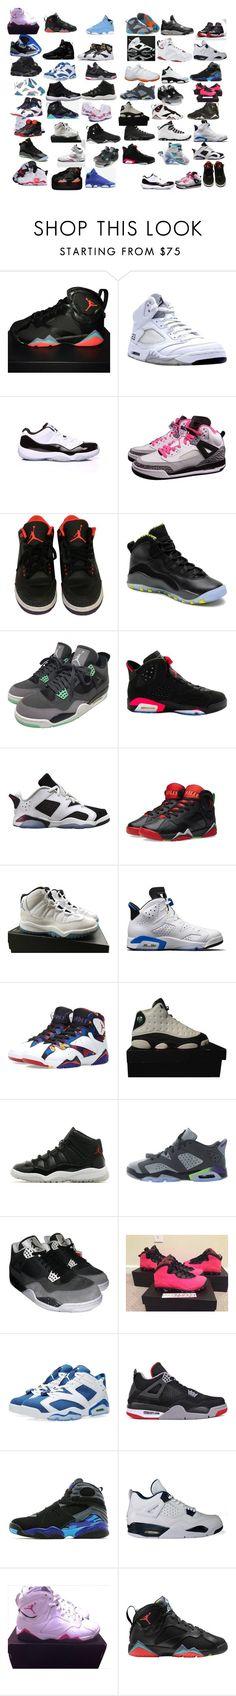 """all Jordans"" by callmeyaya ❤ liked on Polyvore featuring NIKE, Concord, Retrò, Jordan Brand and Freaker"